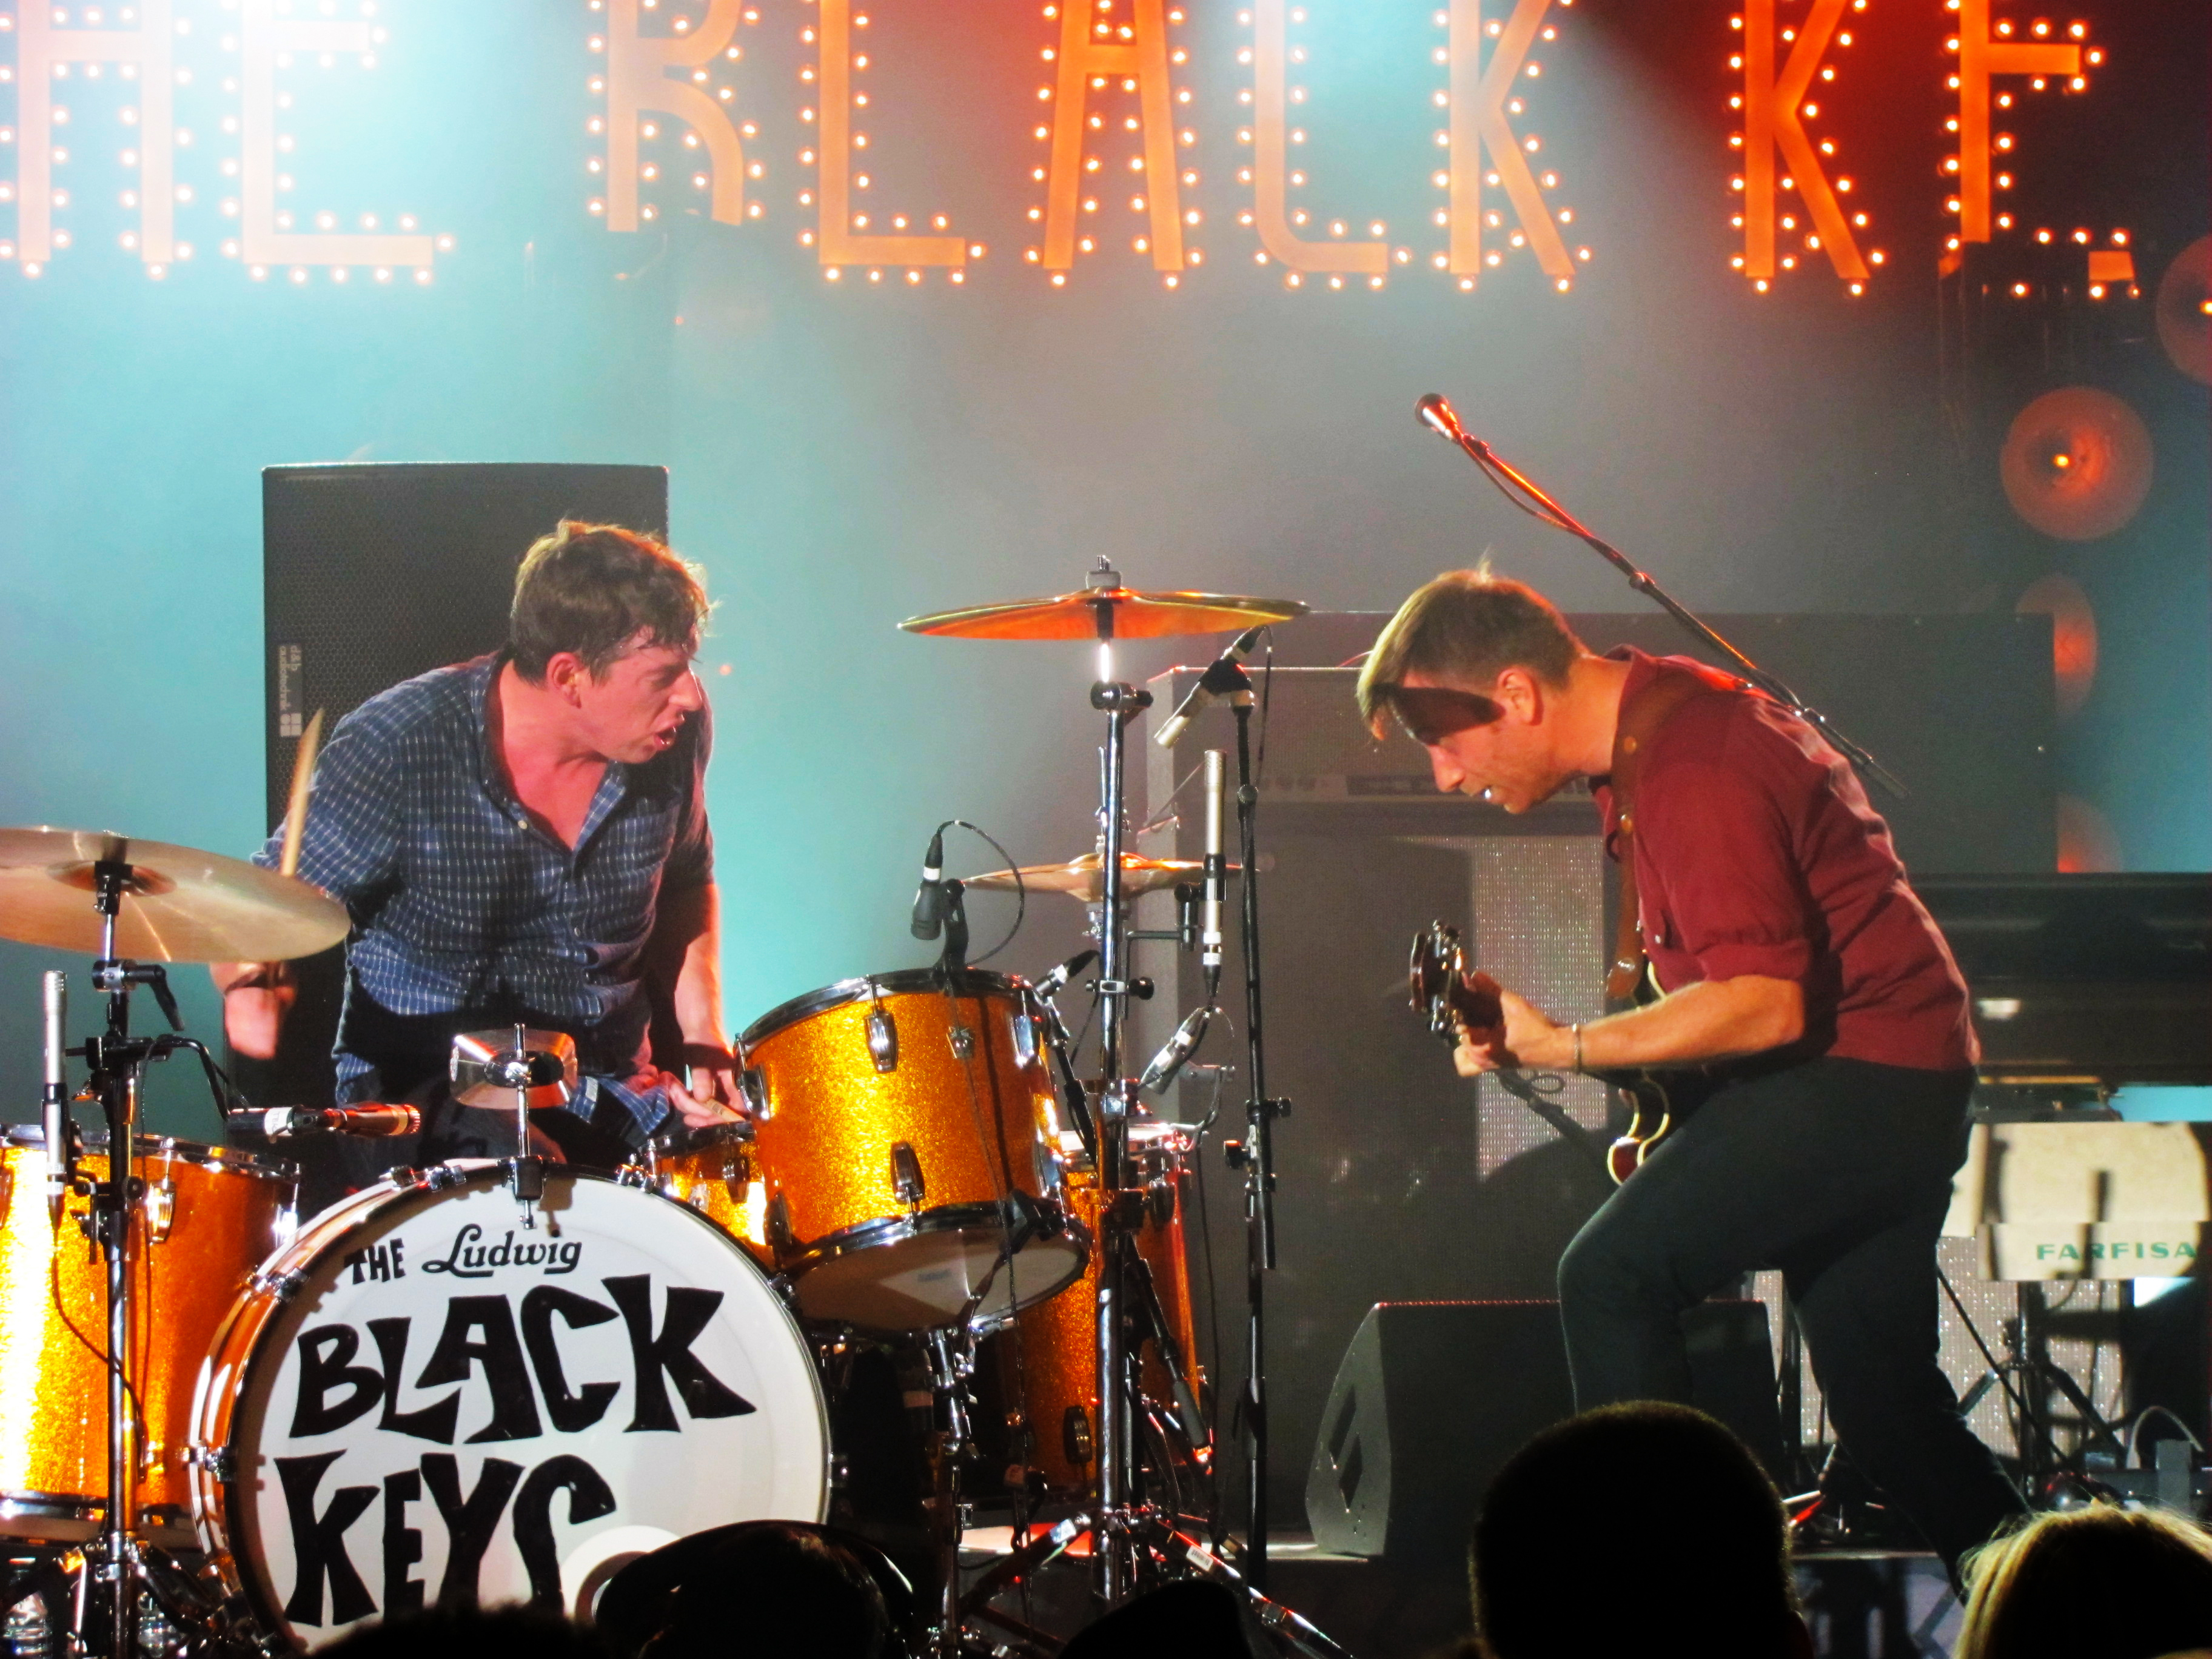 The Black Keys discography - Wikipedia